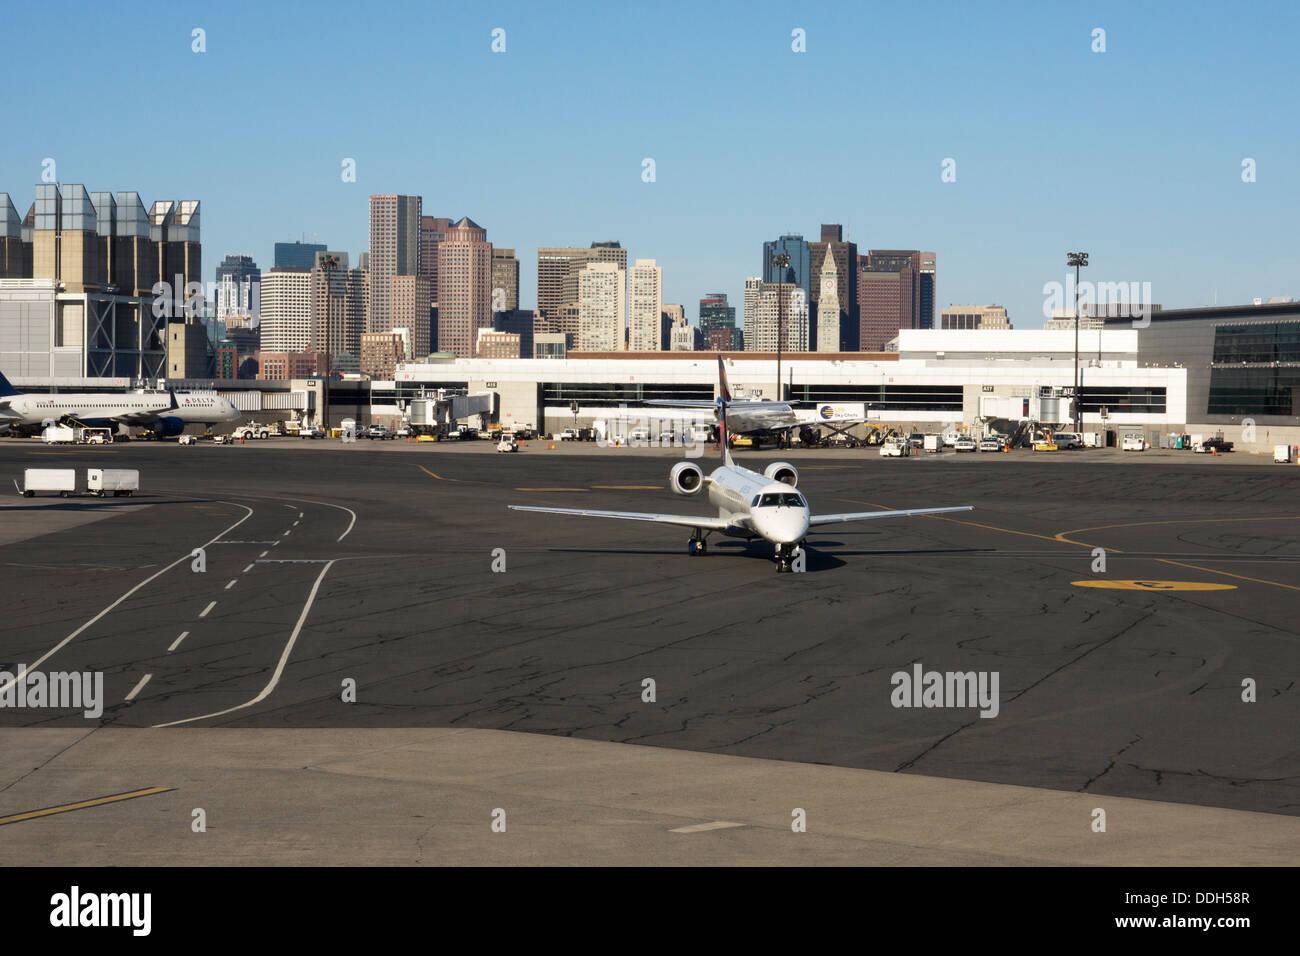 Aircraft arriving at Logan International Airport in Boston - Stock Image